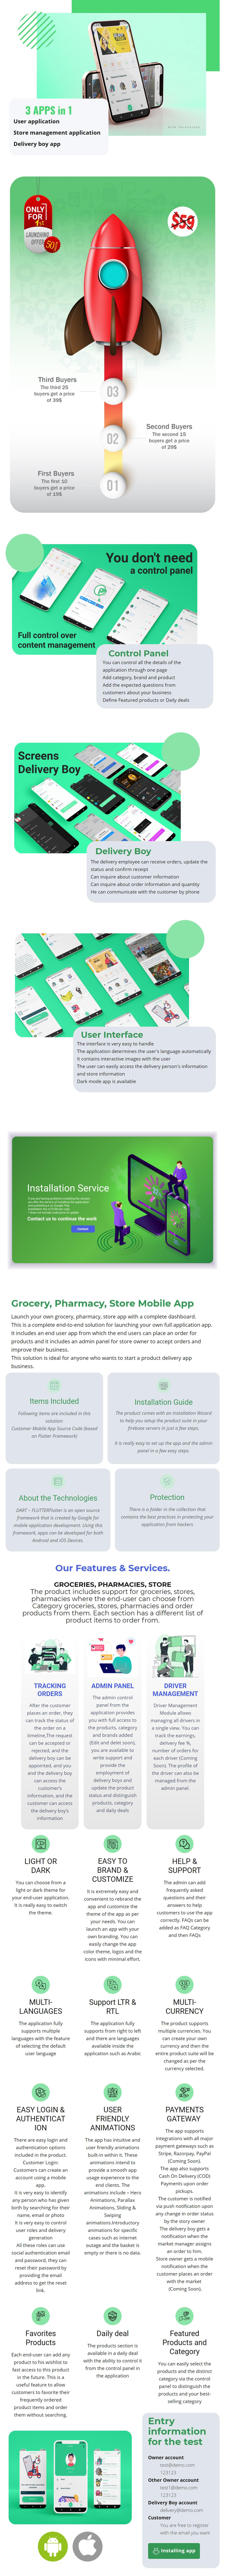 Grocery, Pharmacy, Store Mobile App - 1